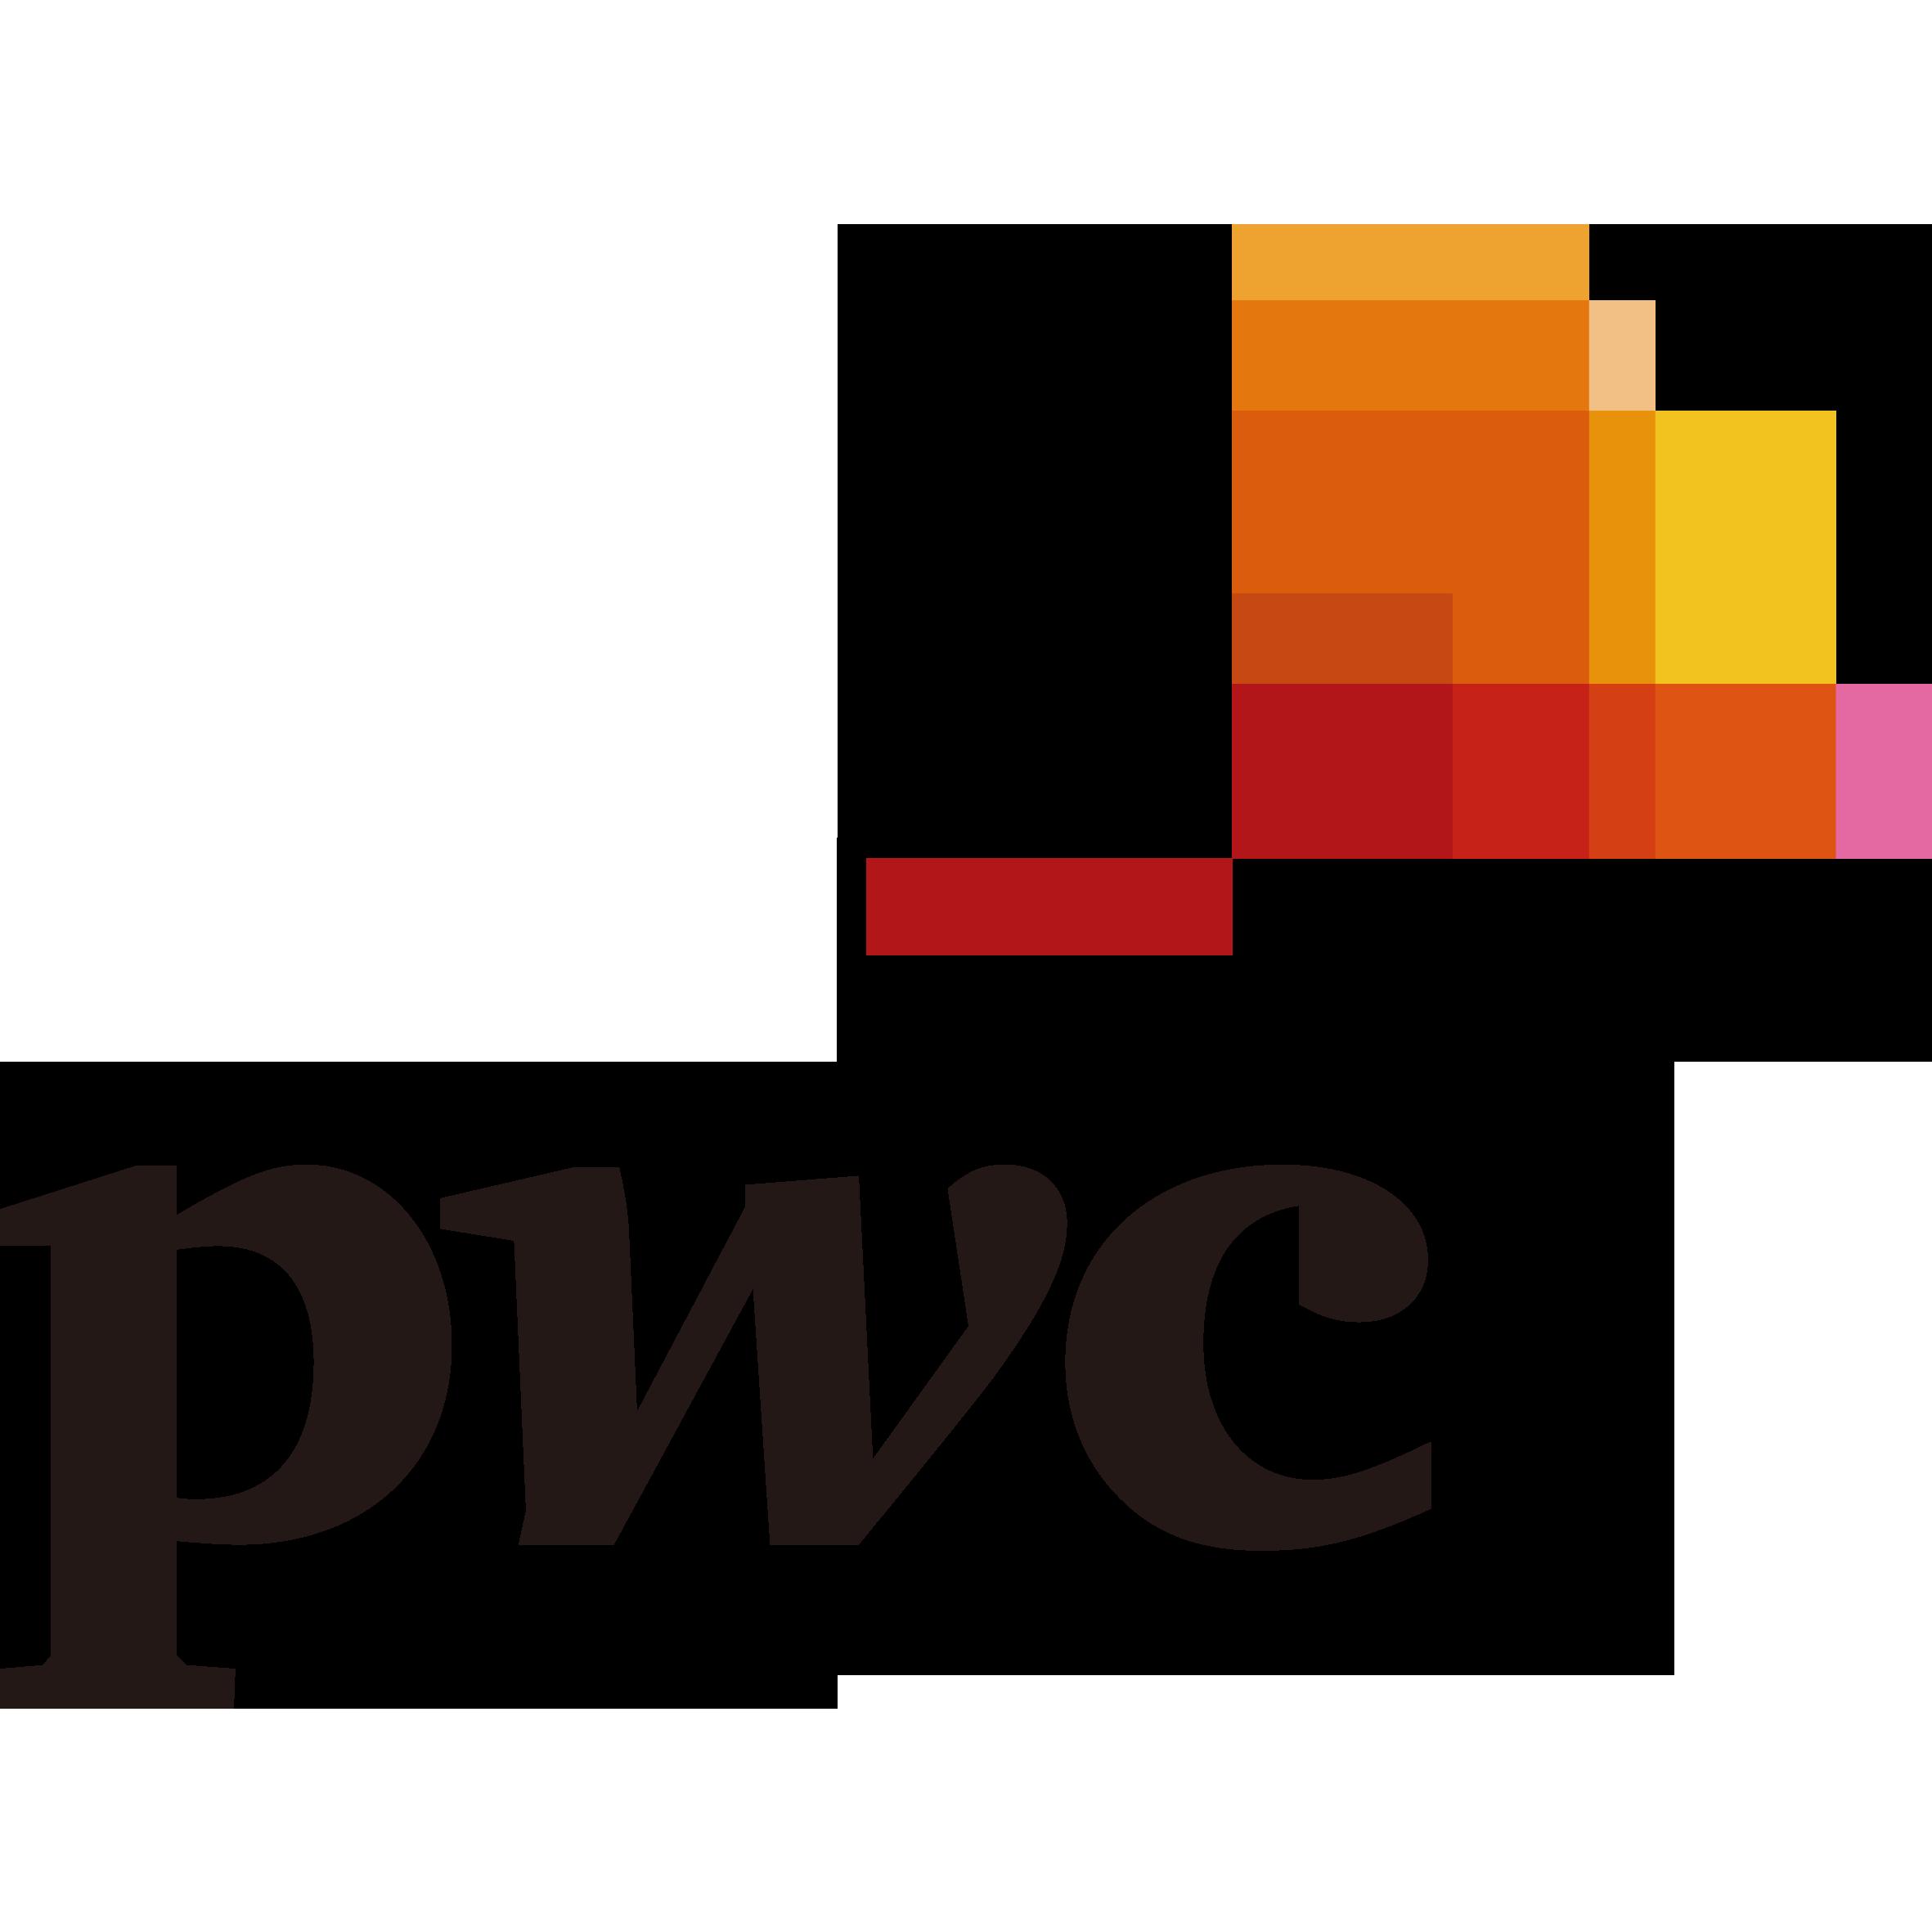 PricewaterhouseCoopers Hong Kong